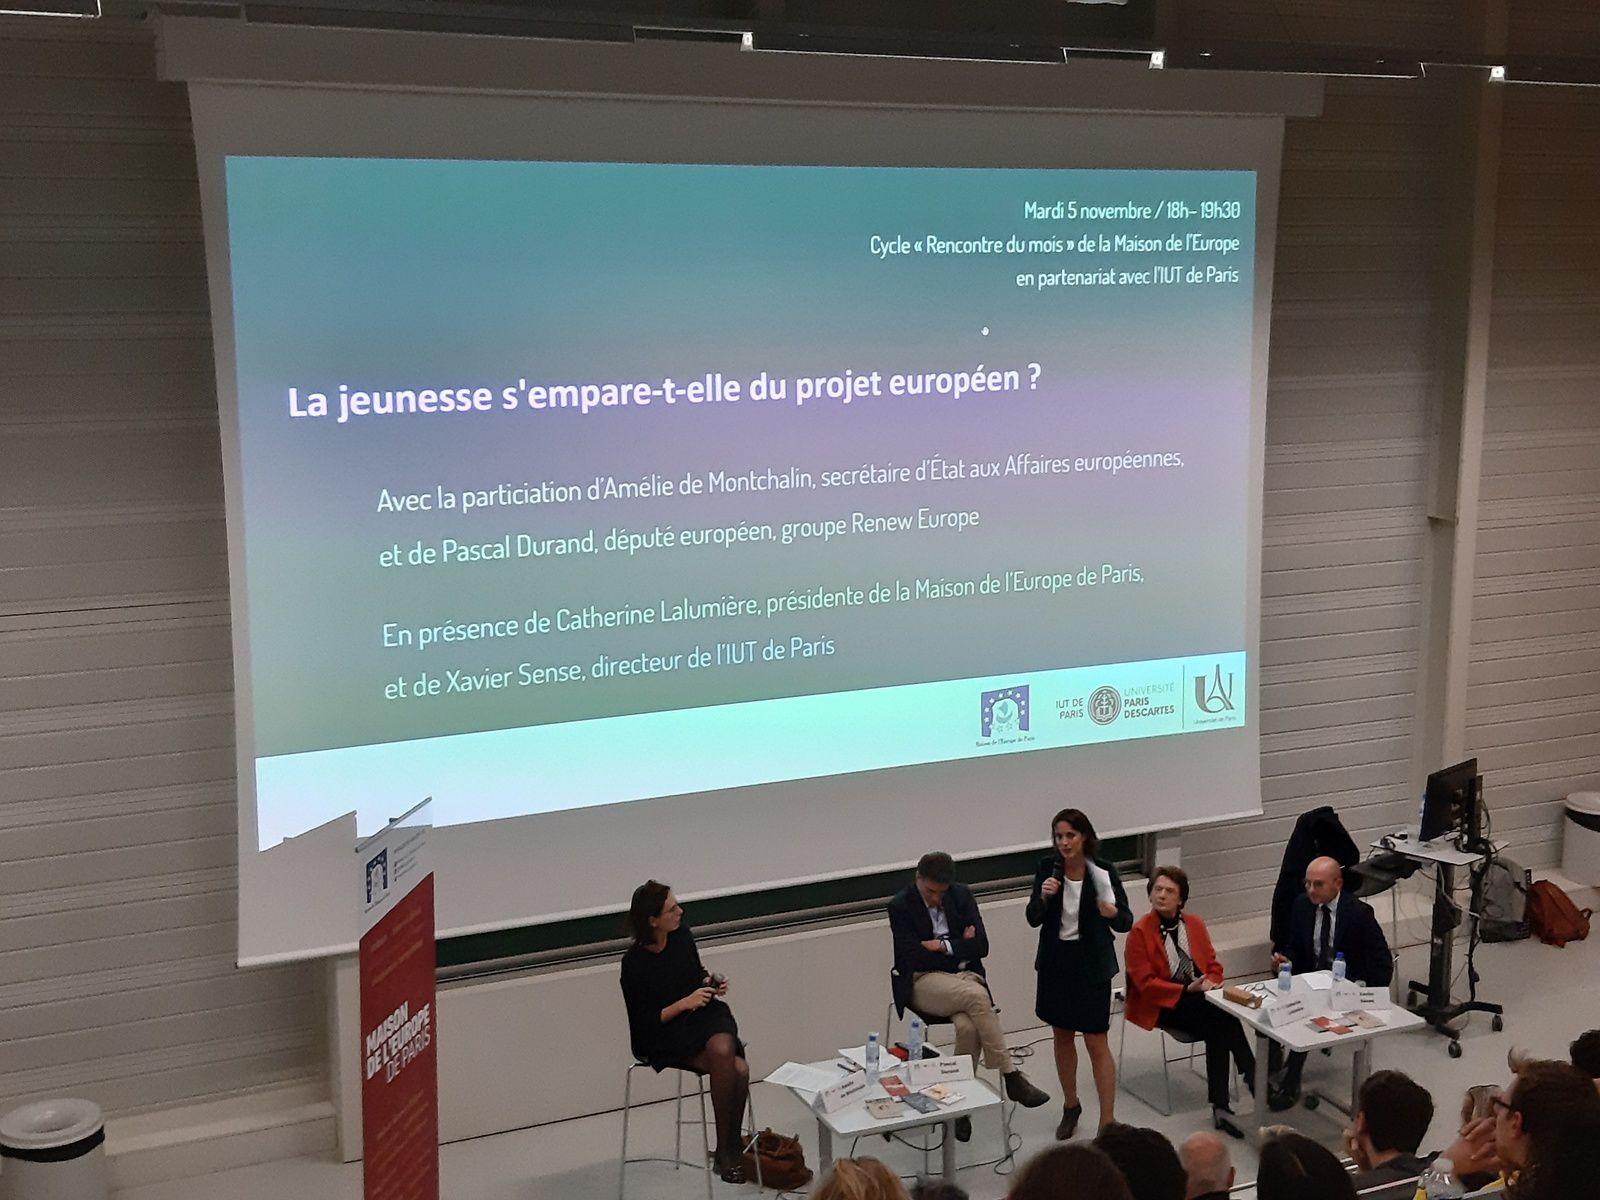 conférence LA JEUNESSE S'EMPARE-T-ELLE DU PROJET EUROPEEN ?